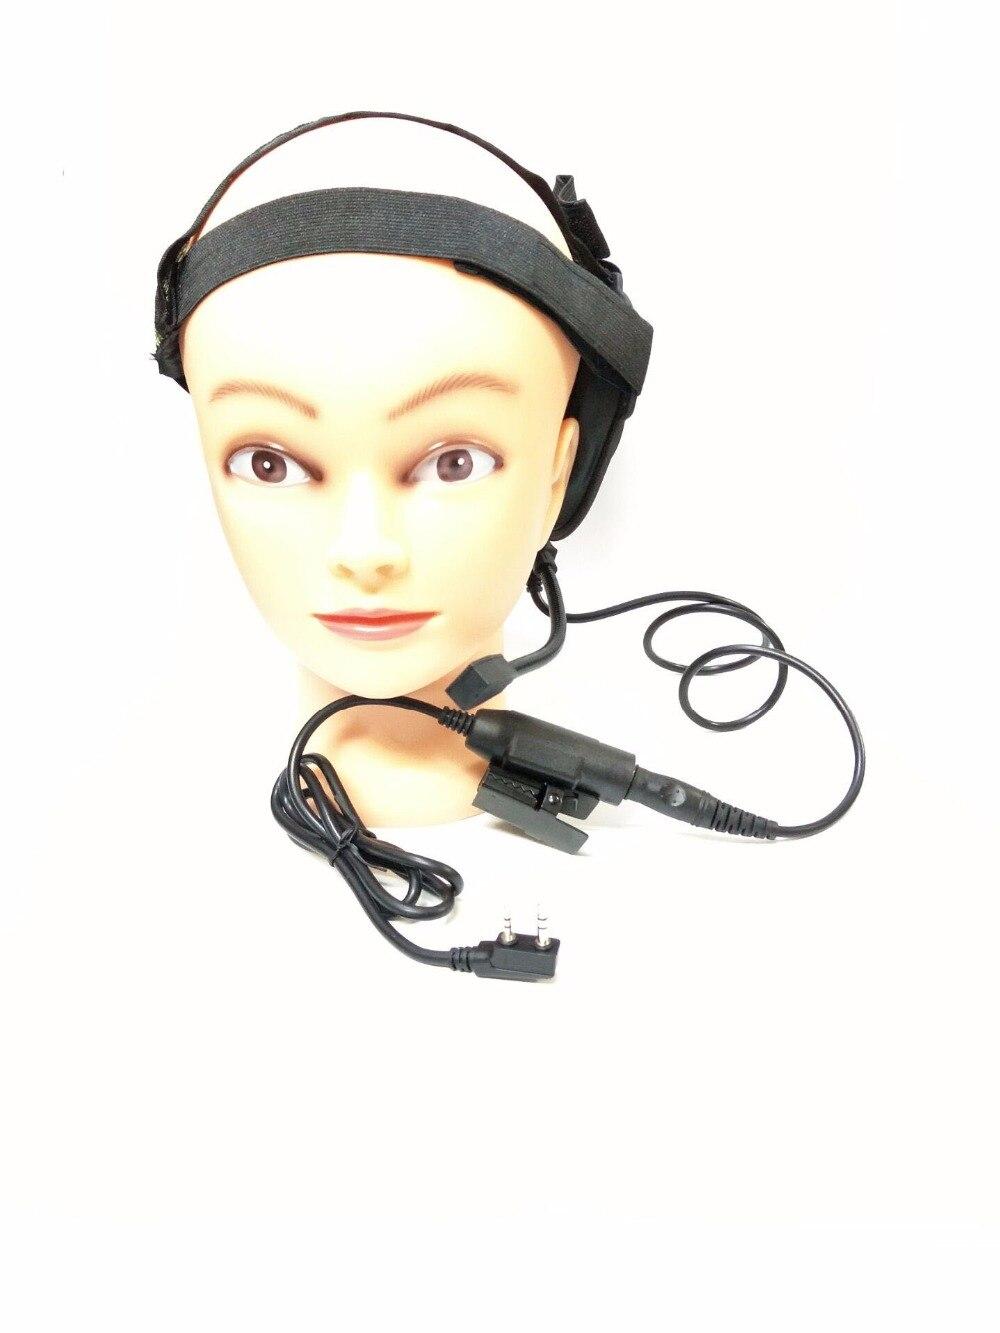 Z Tático Bowman Elite II Headset com U94 HD01 OPPXUN Estilo PTT para Kenwood BaoFeng UV-5R UV-82 BF-888S BF-F9 V2 + PuXing